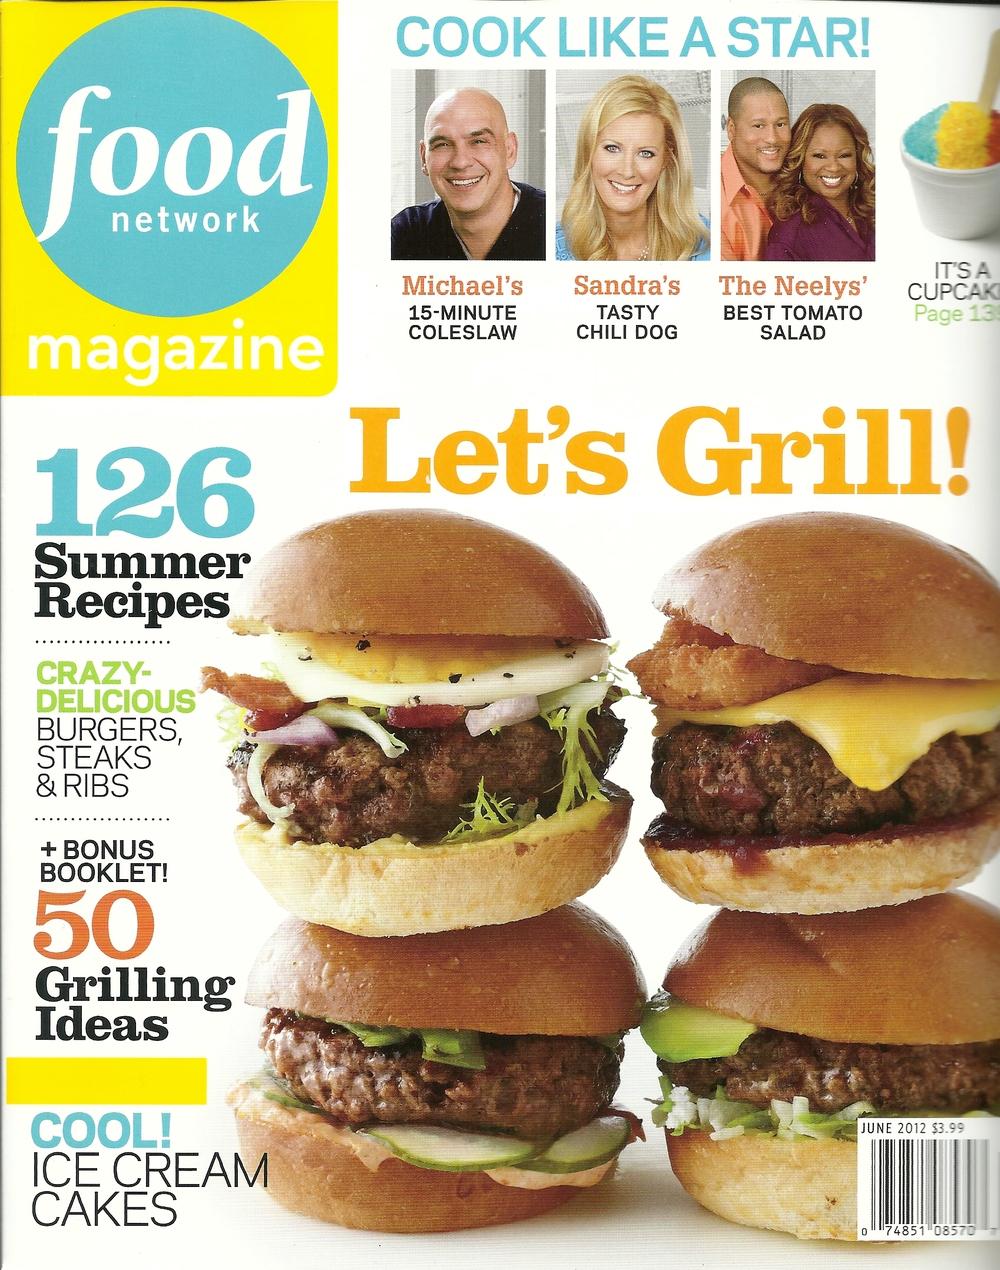 Food Network Mag 2a.jpg